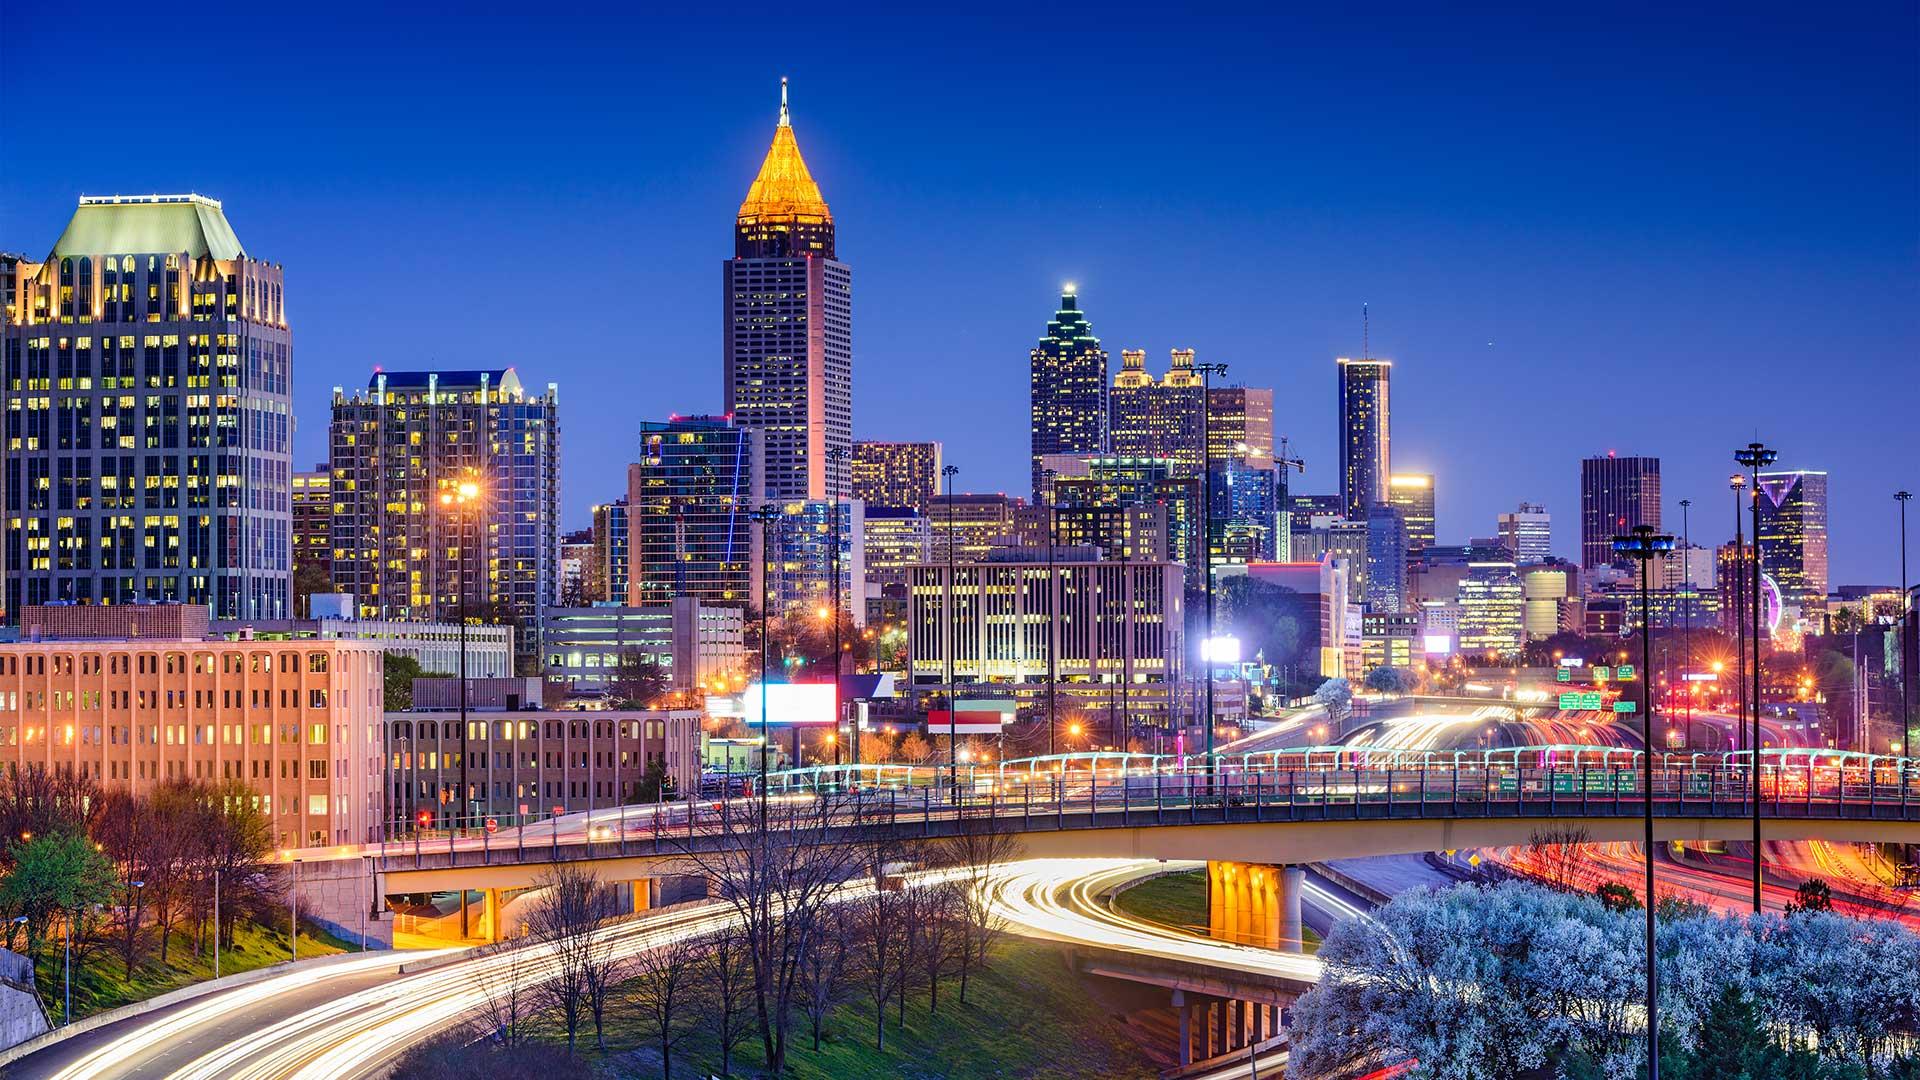 Atlanta free dating sites updating windows xp service pack 1